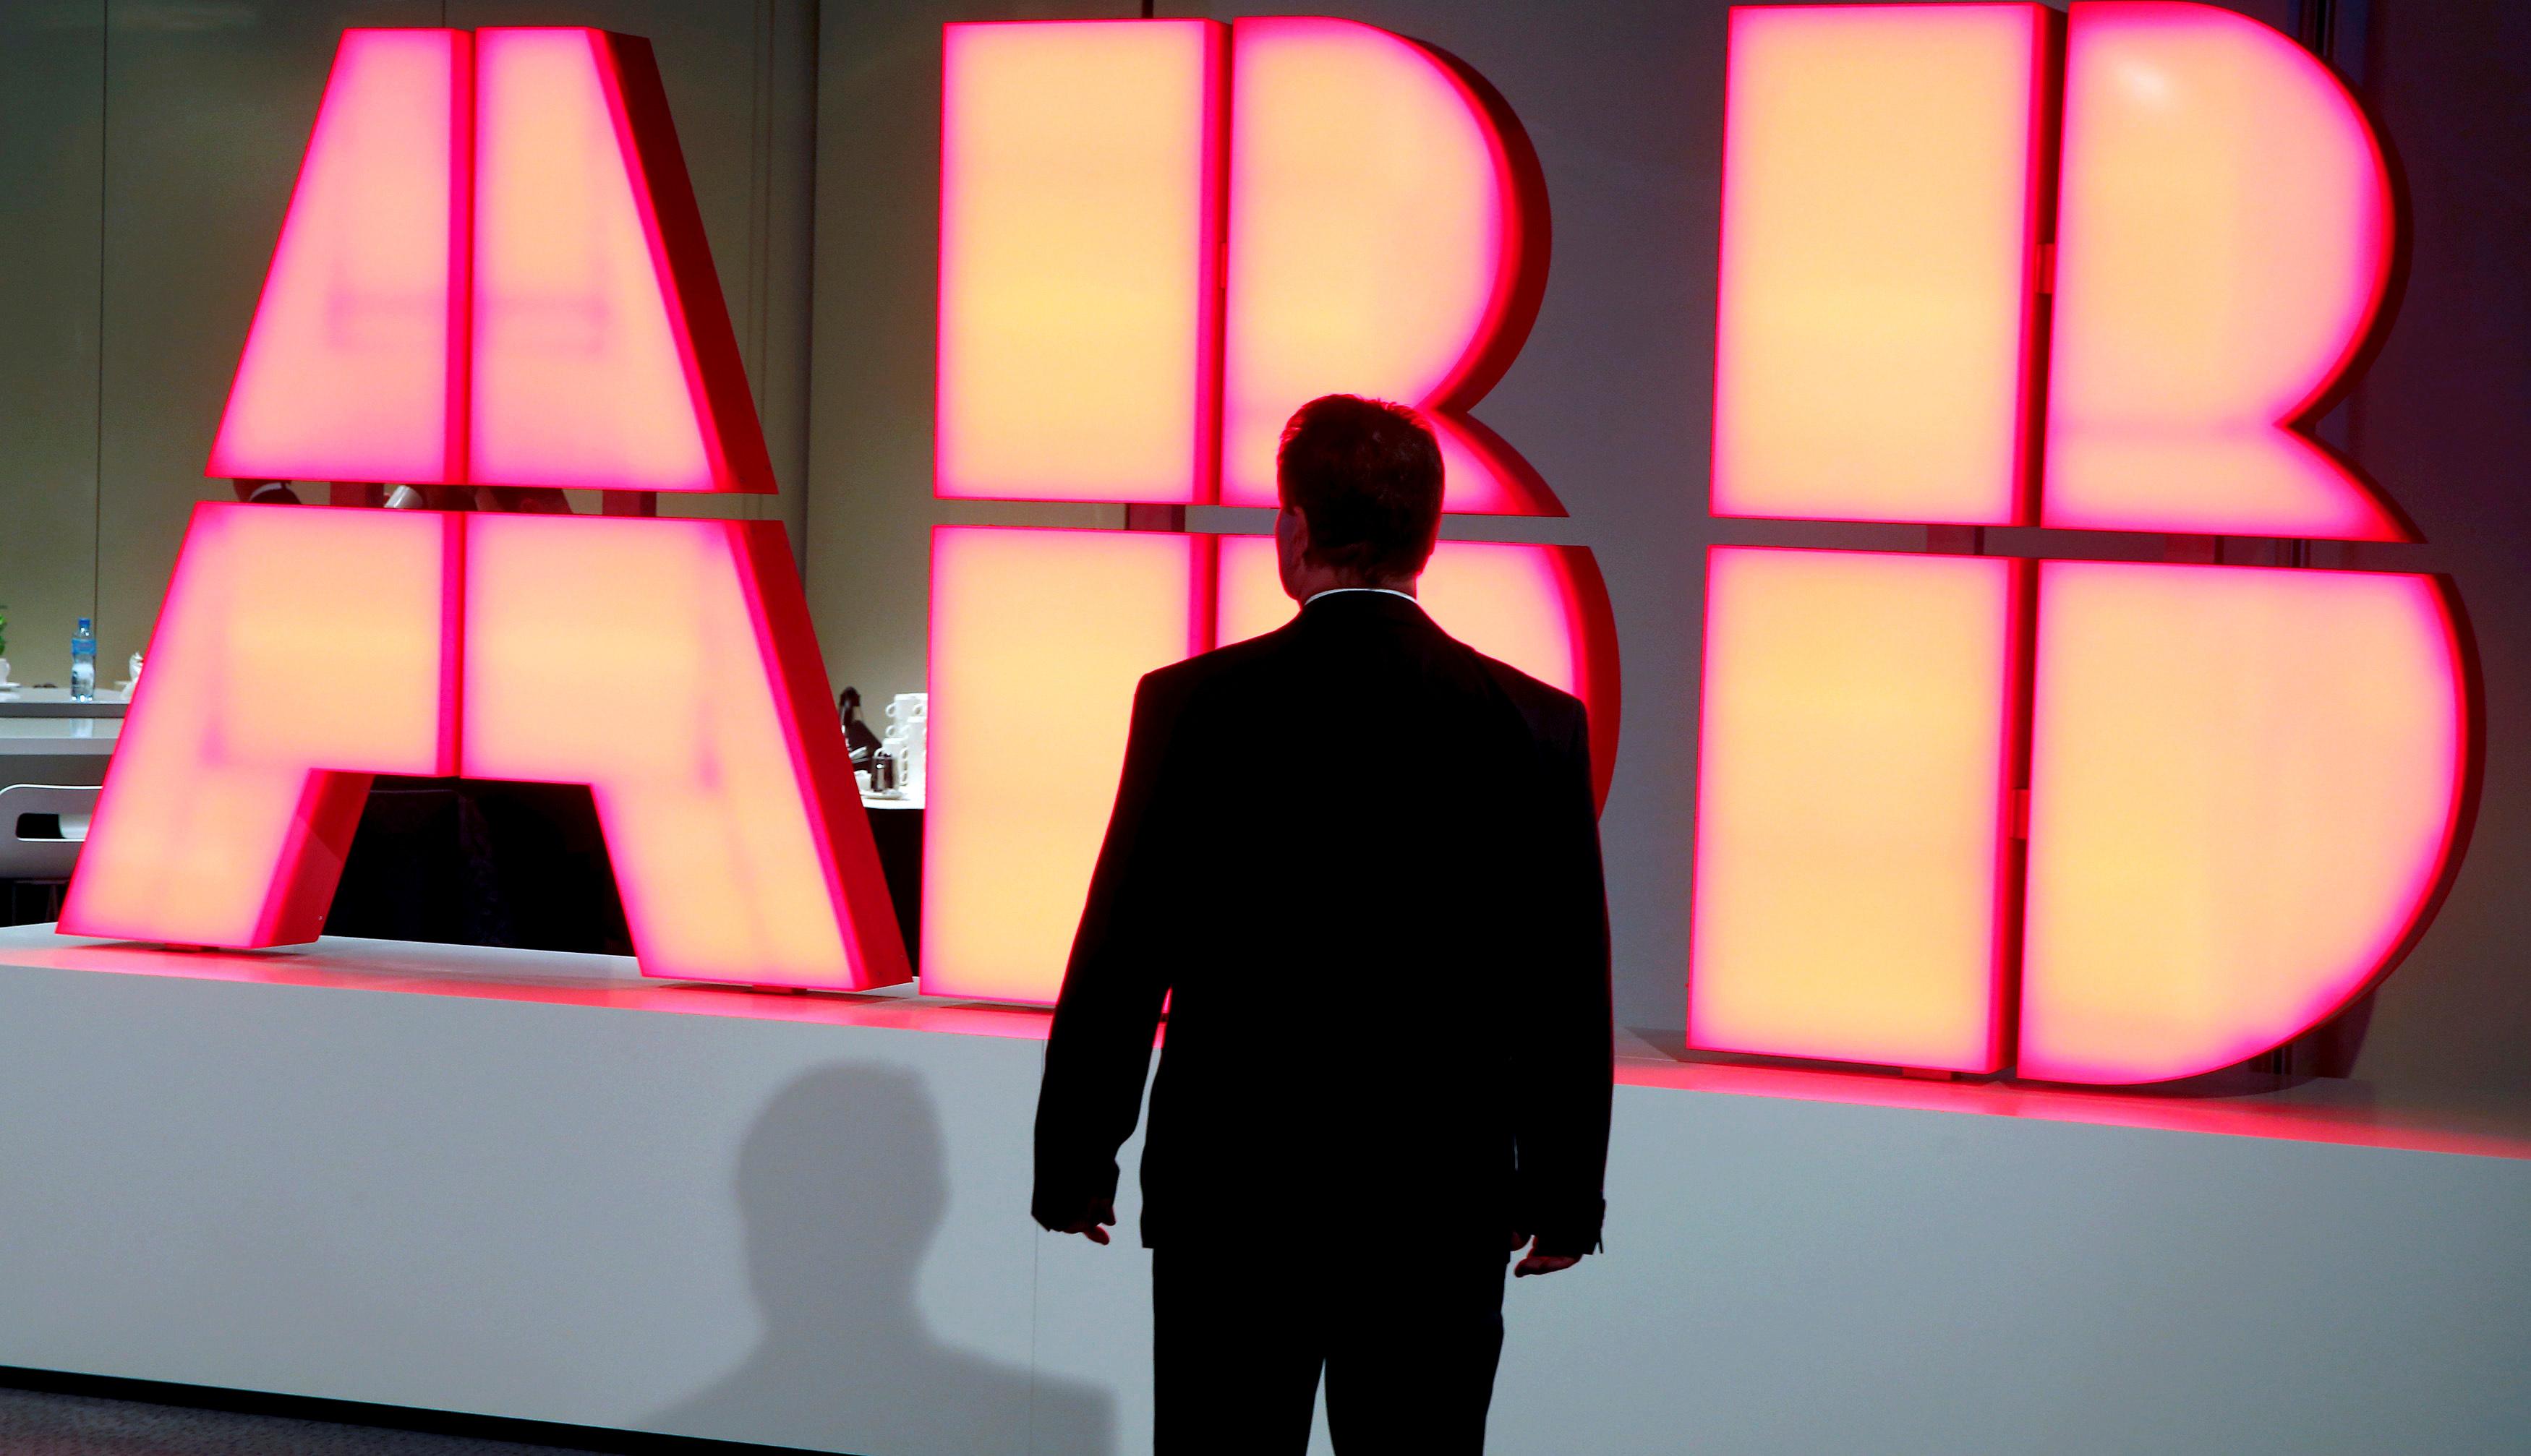 ABB Takes $100 Million Charge After 'Criminal Scheme' at South Korea Unit